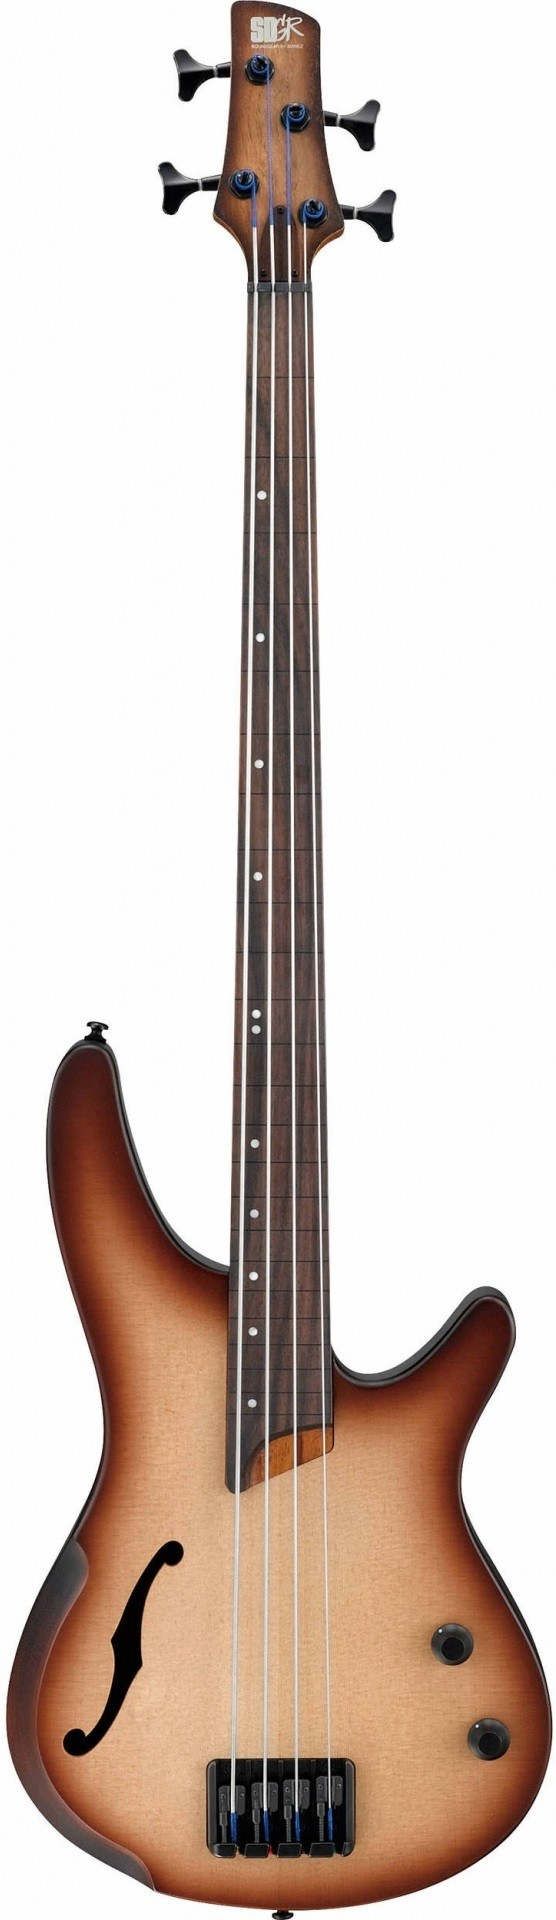 Бас-гитара Ibanez SRH500F-NNF Aeirum